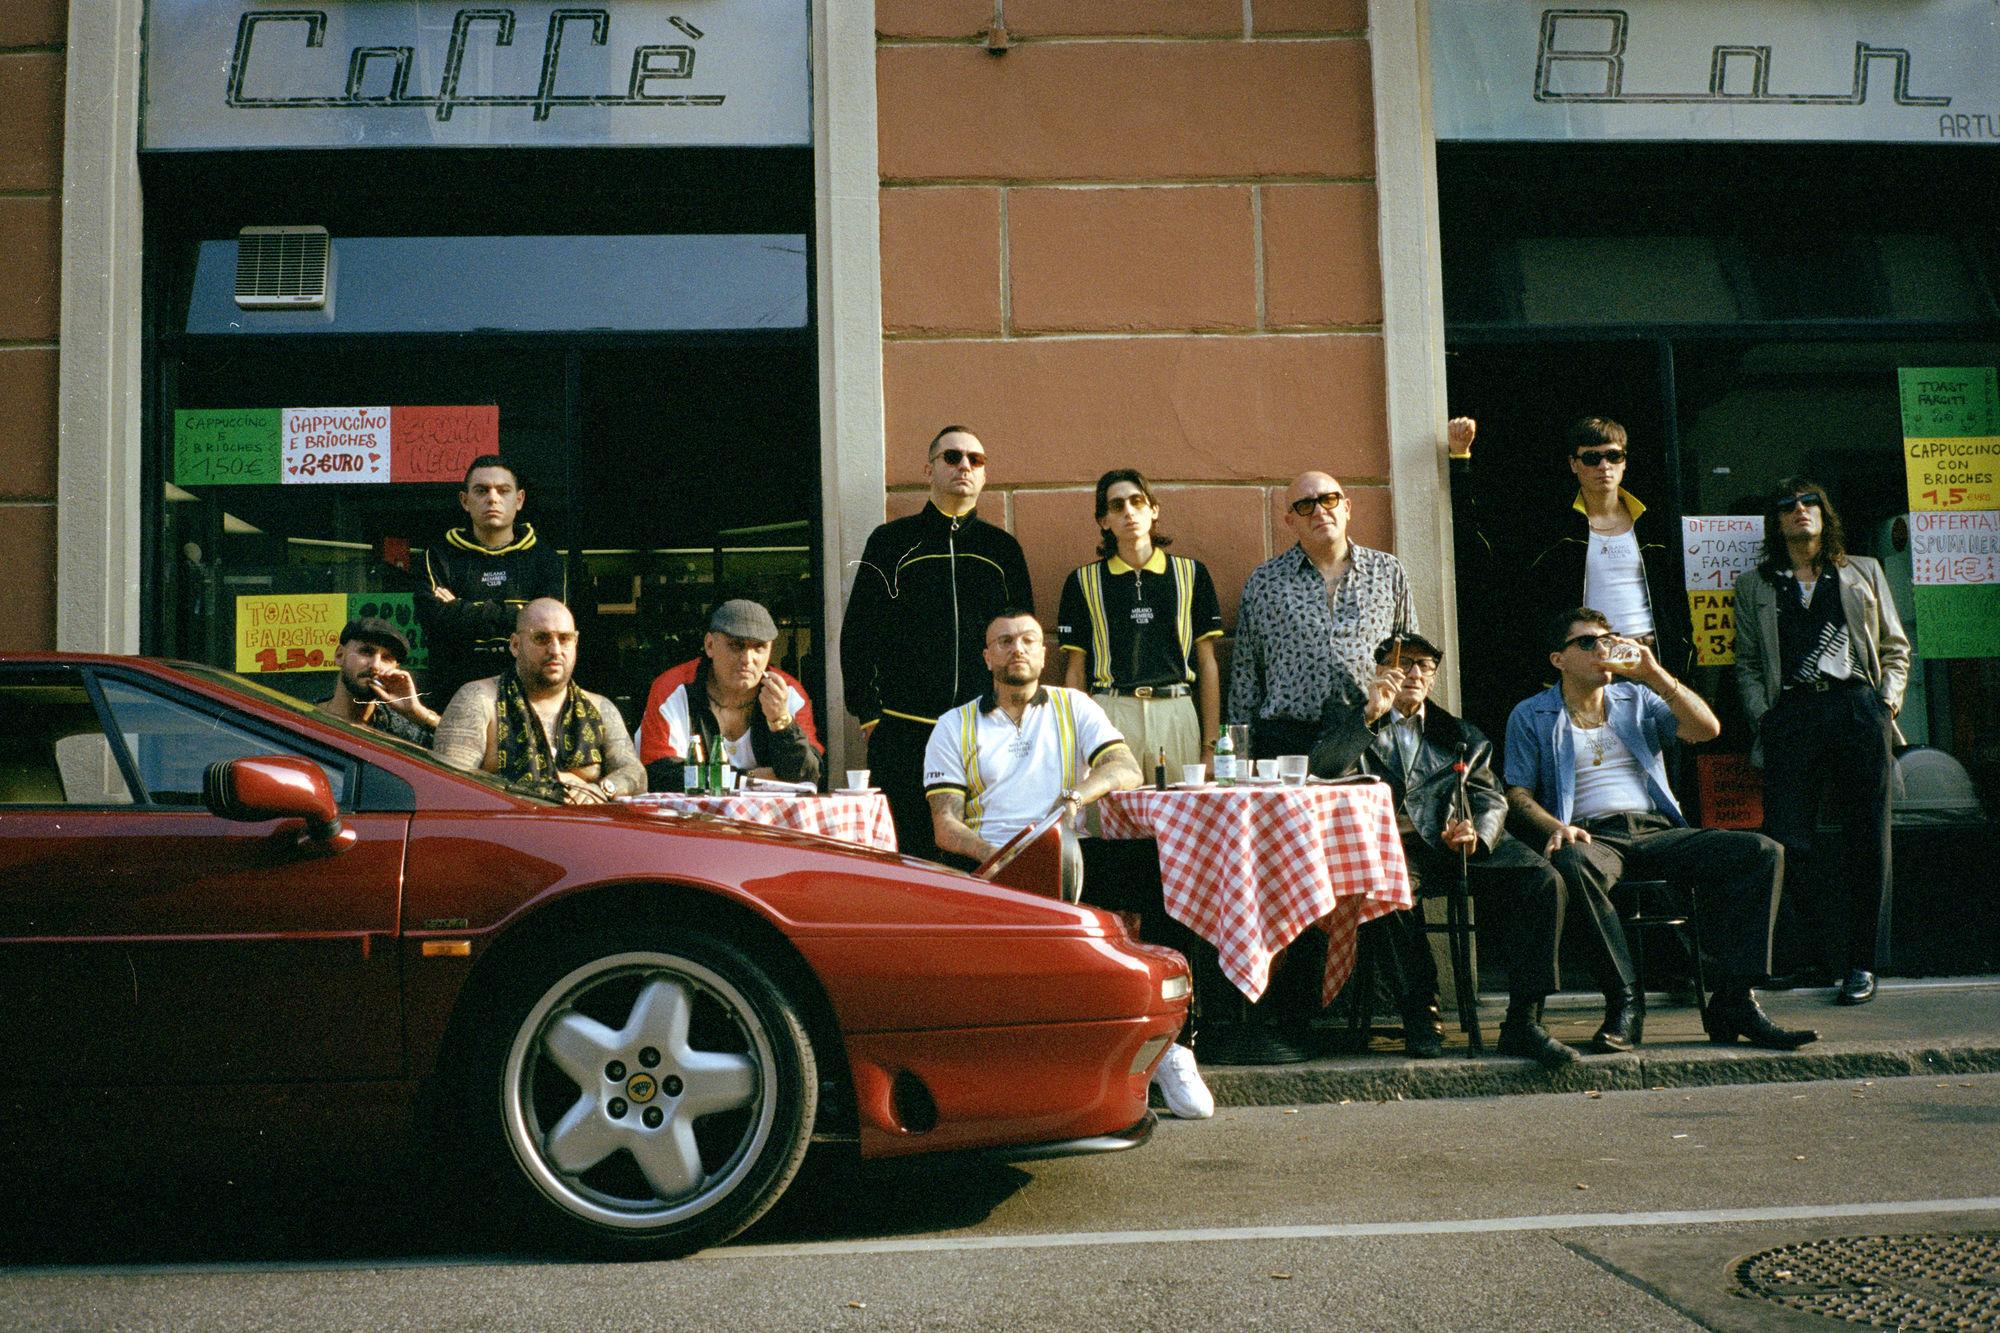 Milano Members Club 3-4 Nov. ComplexCon, IUTER Store, Online Store